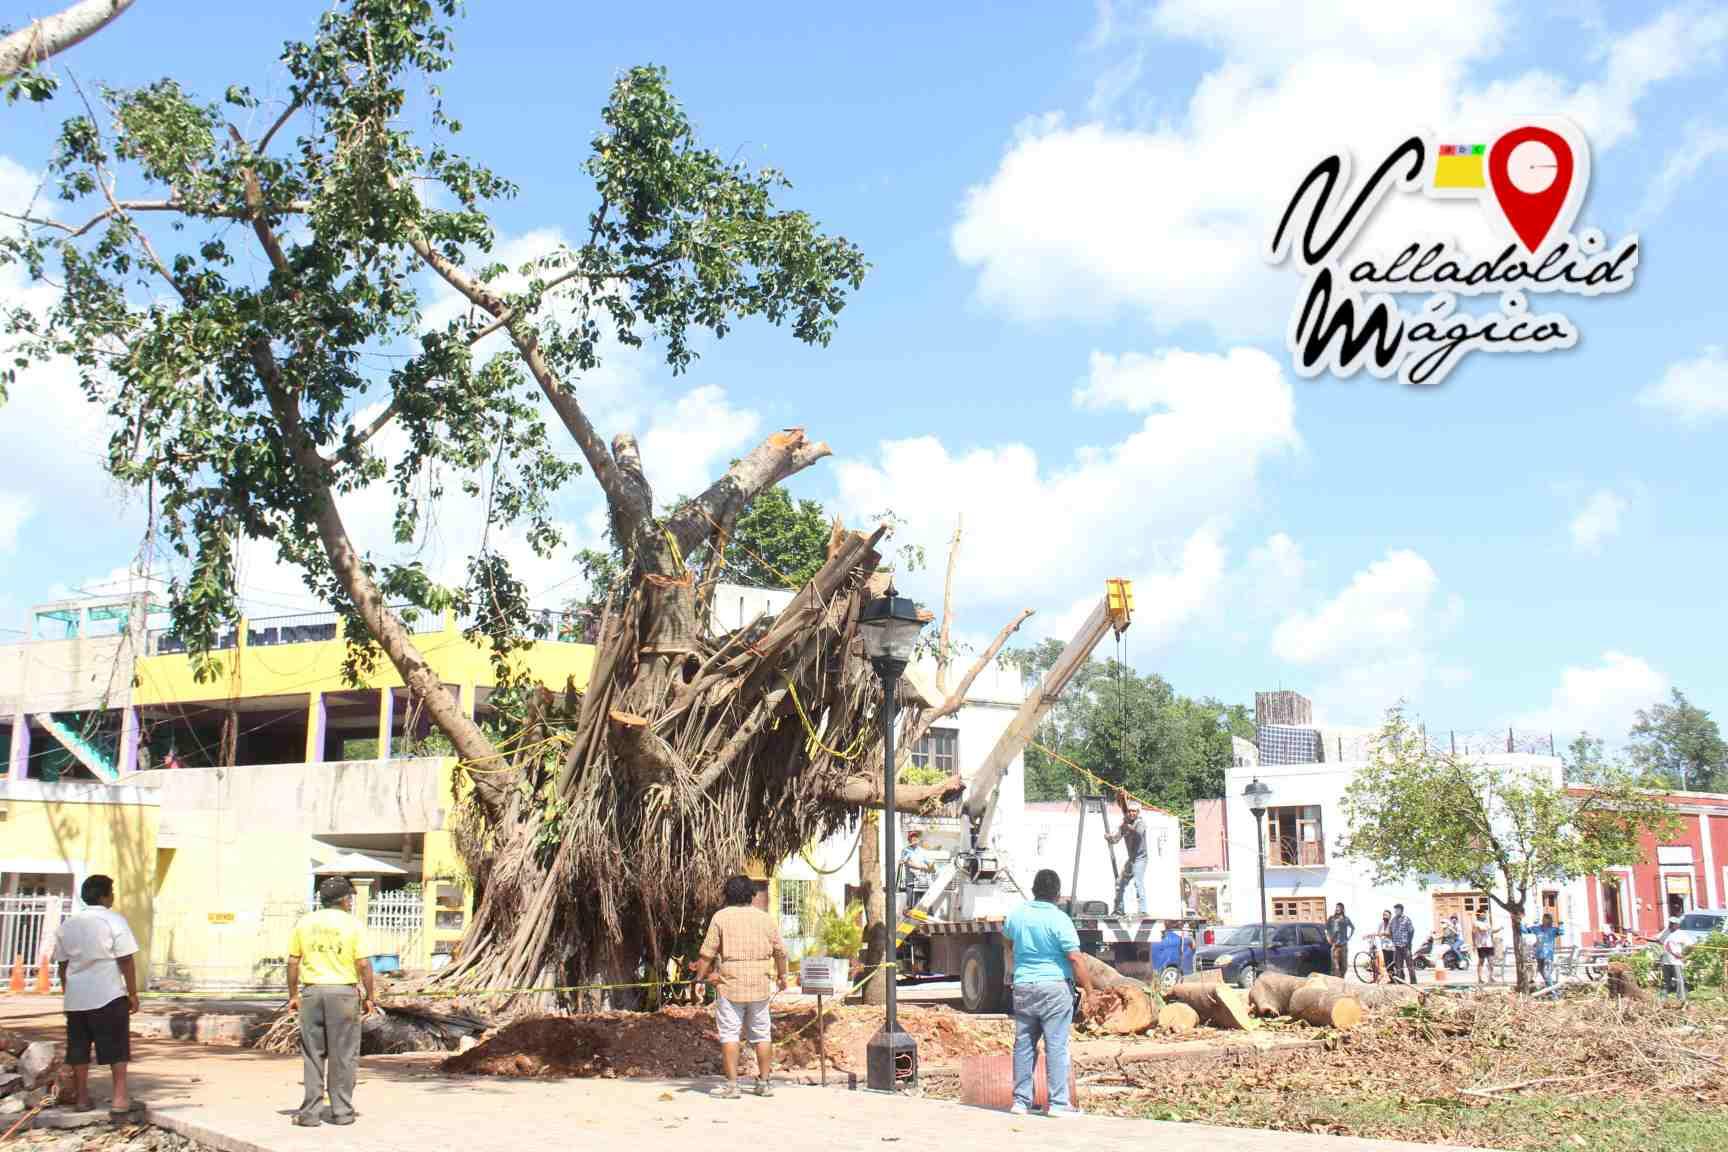 Suma de voluntades para rescatar árbol emblemático